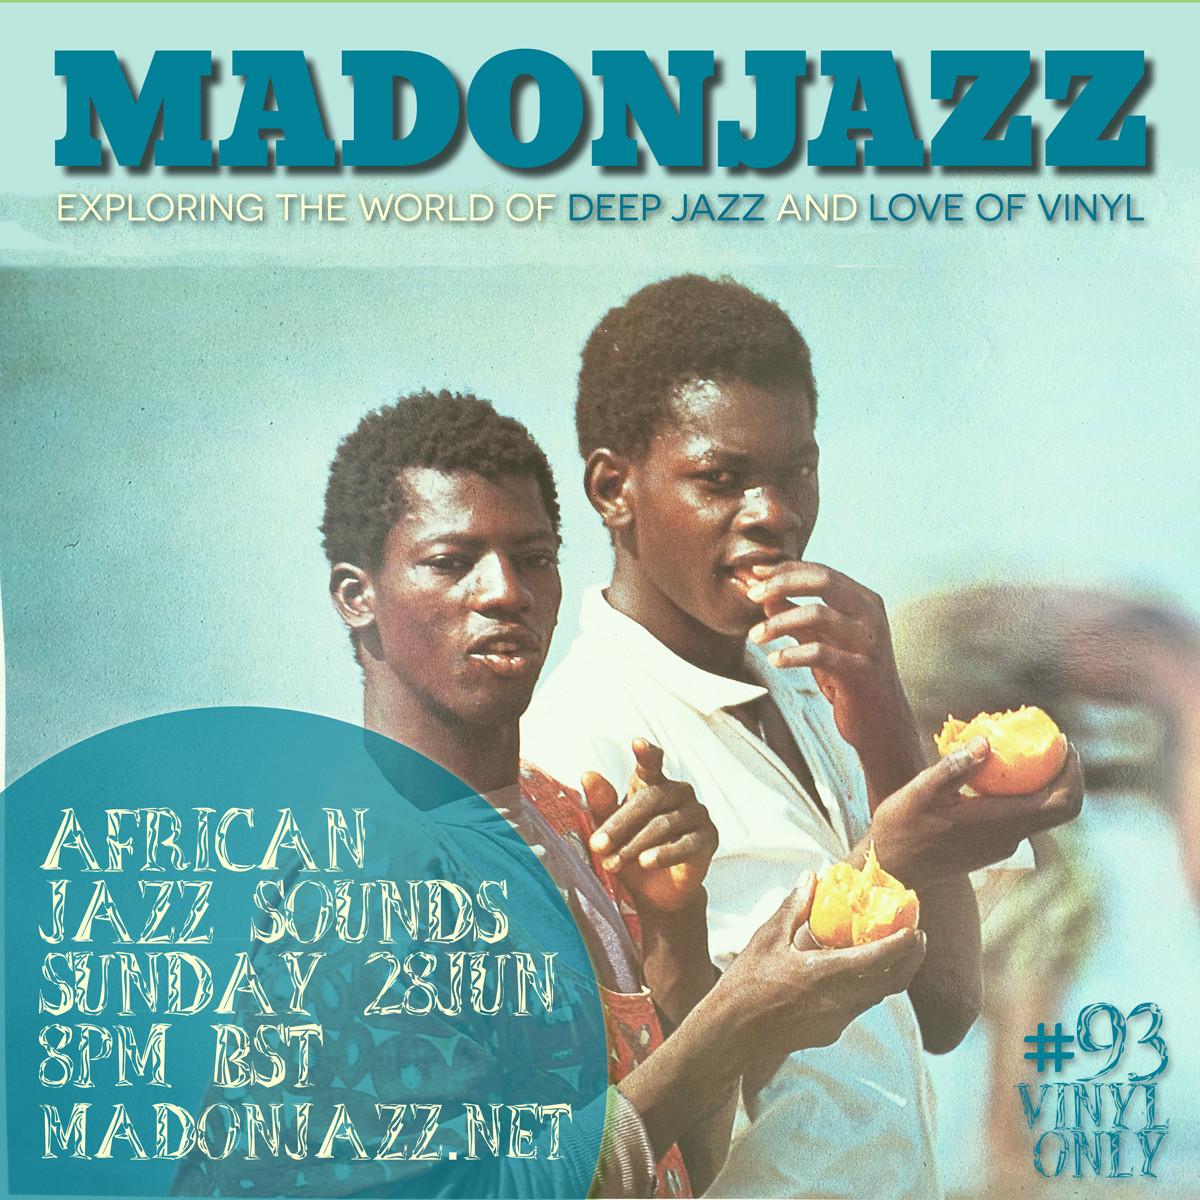 MADONJAZZ AFRICAN JAZZ SOUNDS VINYL